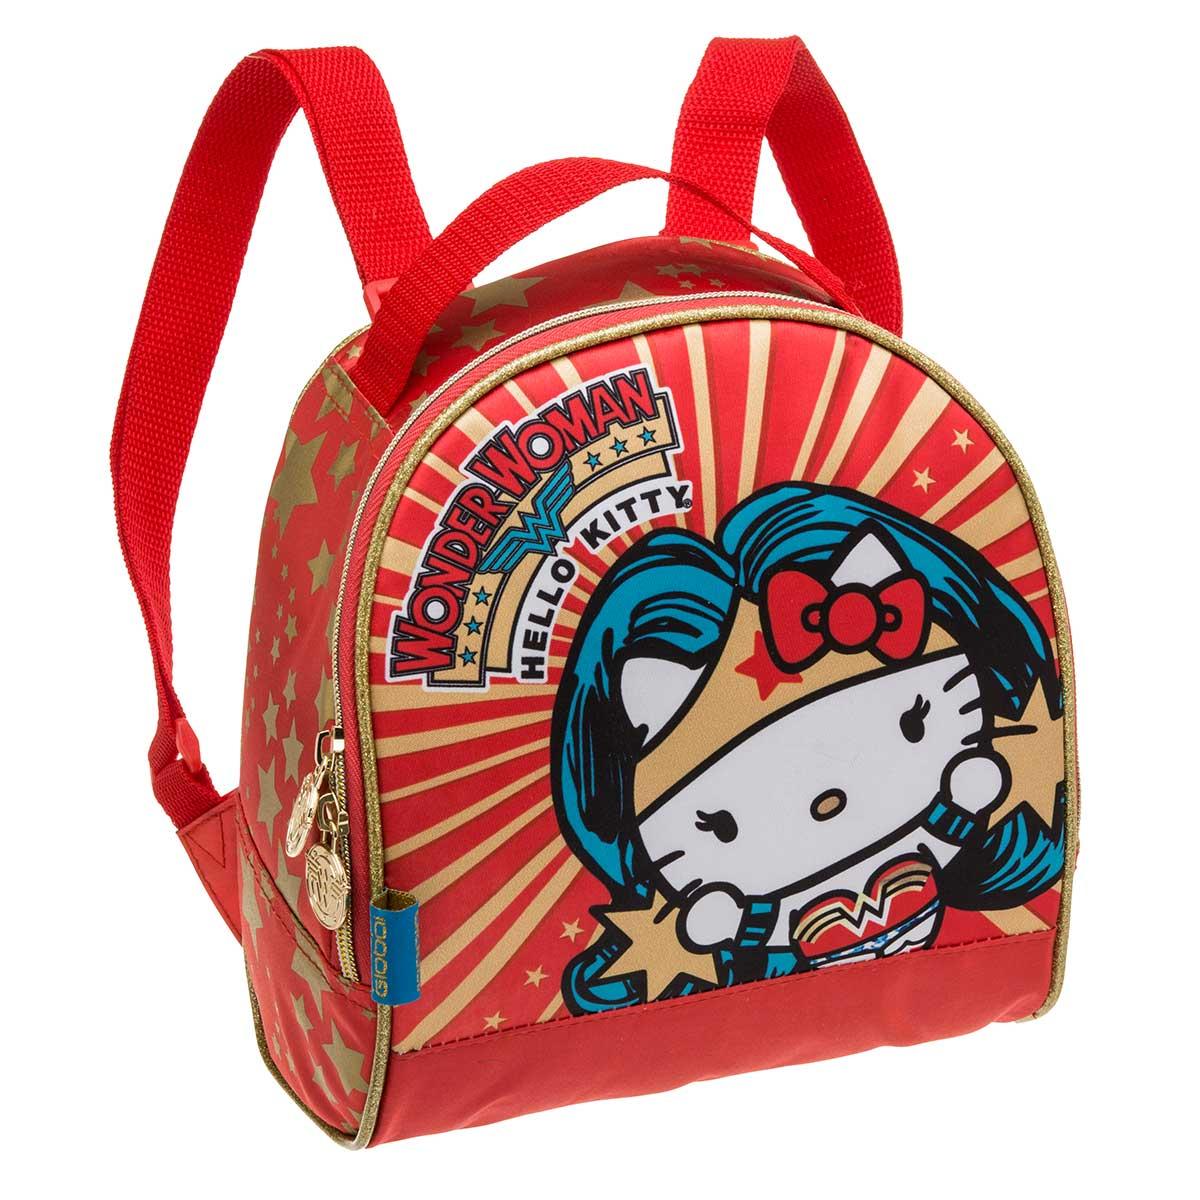 Lancheira com Acessórios Hello Kitty Wonder Woman